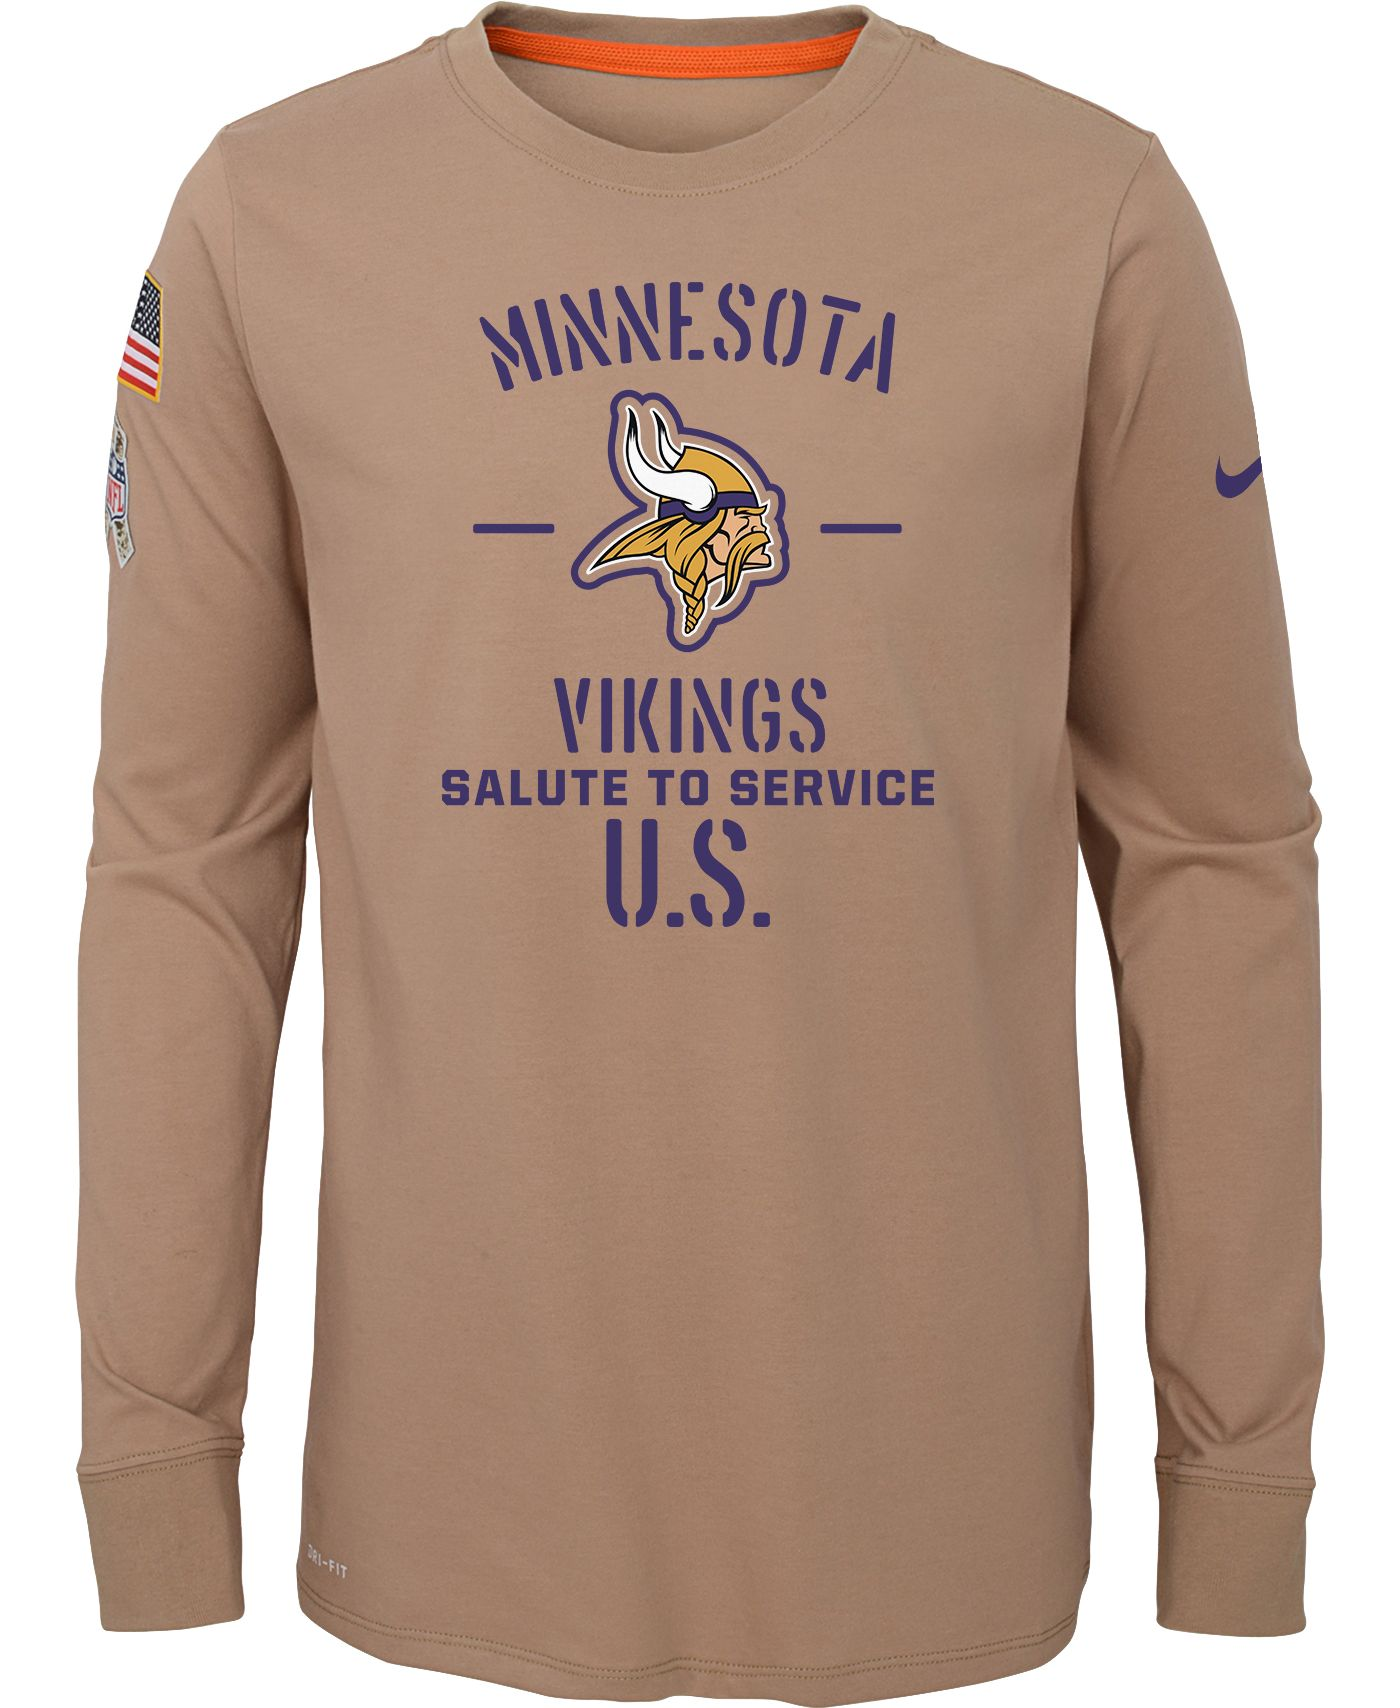 Nike Youth Salute to Service Minnesota Vikings Dri-FIT Beige Long Sleeve Shirt